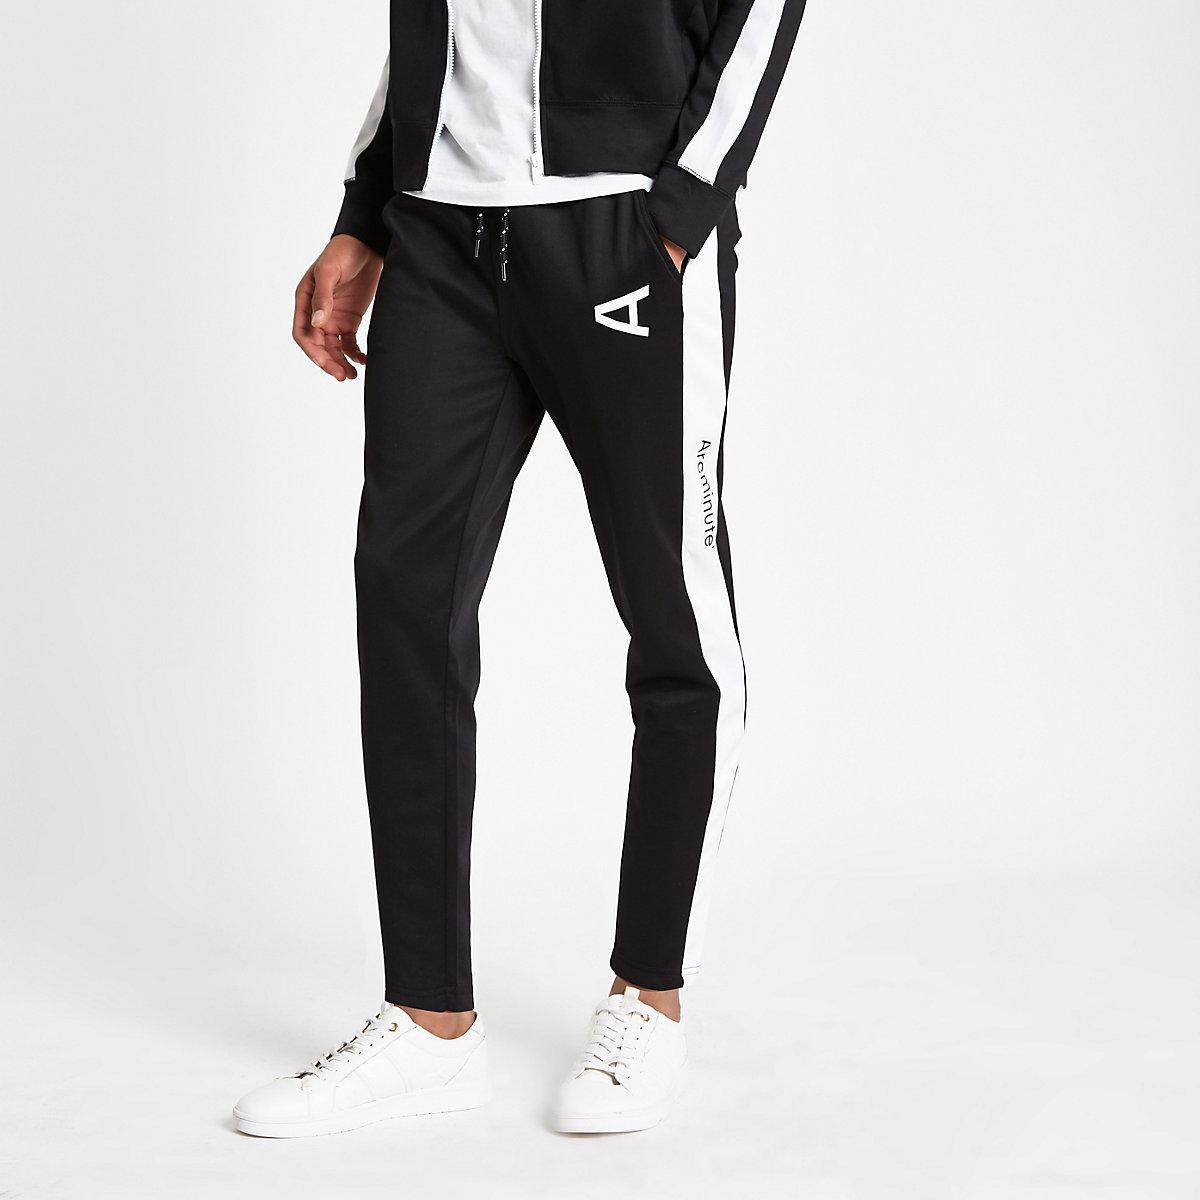 Arcminute – Schwarze Jogginghose mit Logo